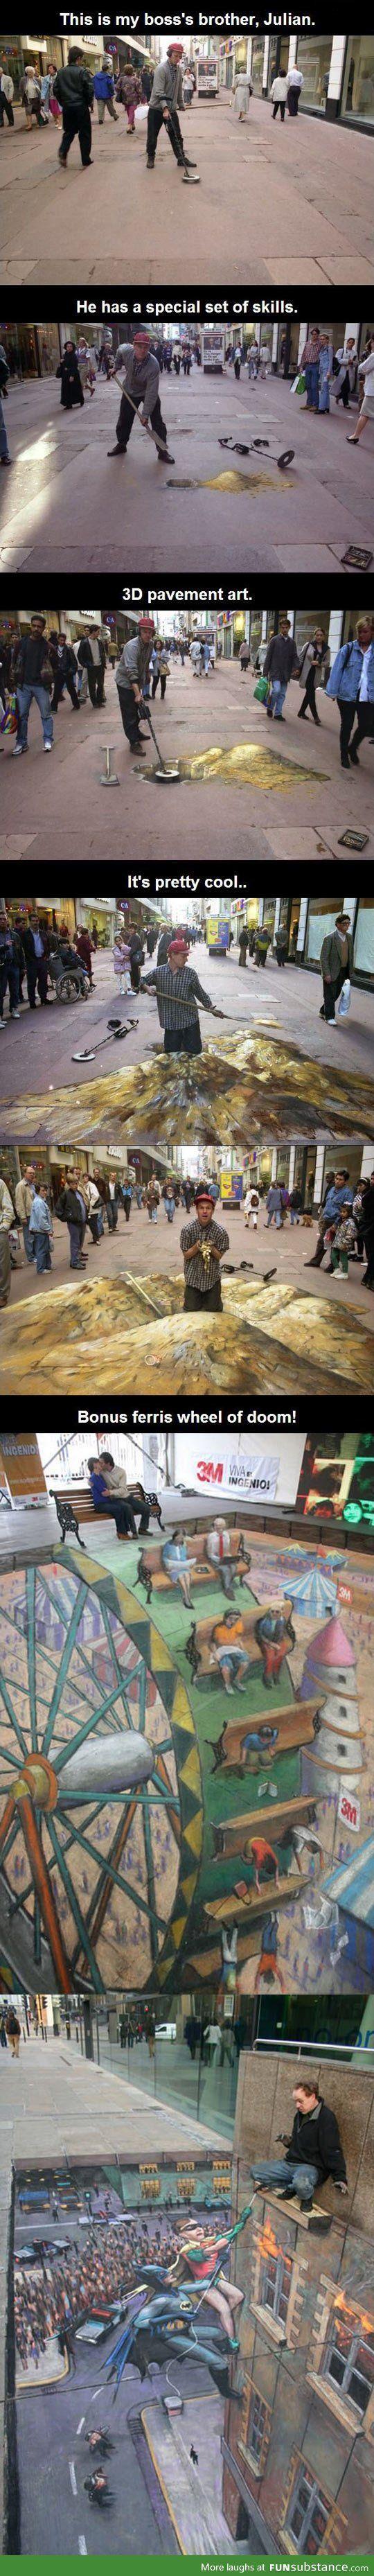 3D pavement art - FunSubstance.com.